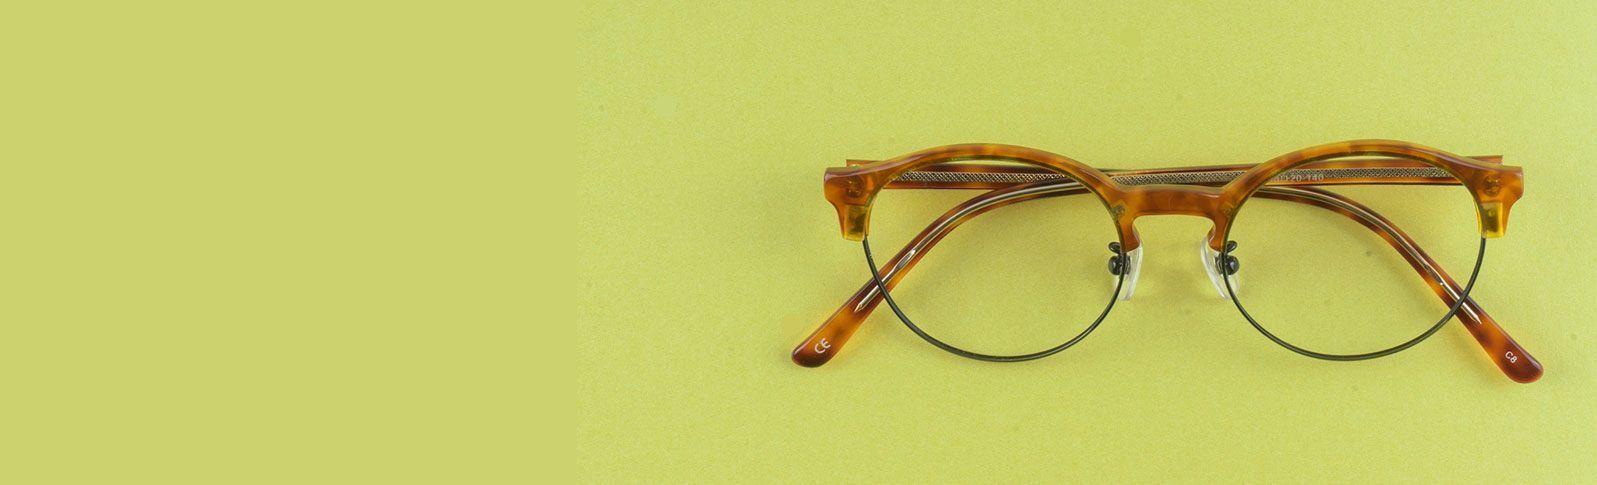 runde brune briller på grønt bord